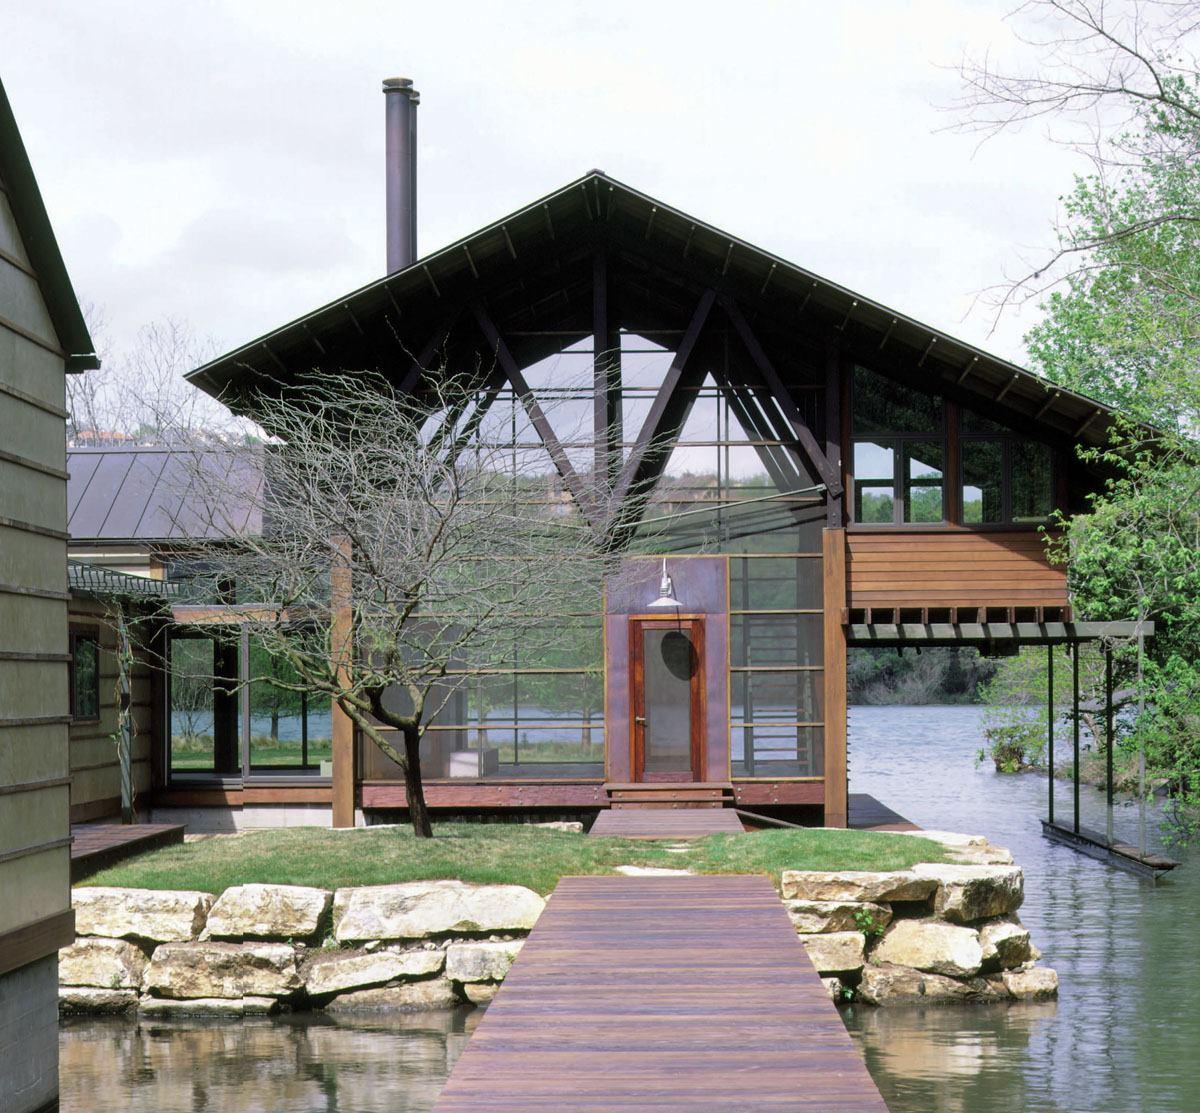 lake austin residence austin texas  Residential Architect  Award Winners Architects Austin